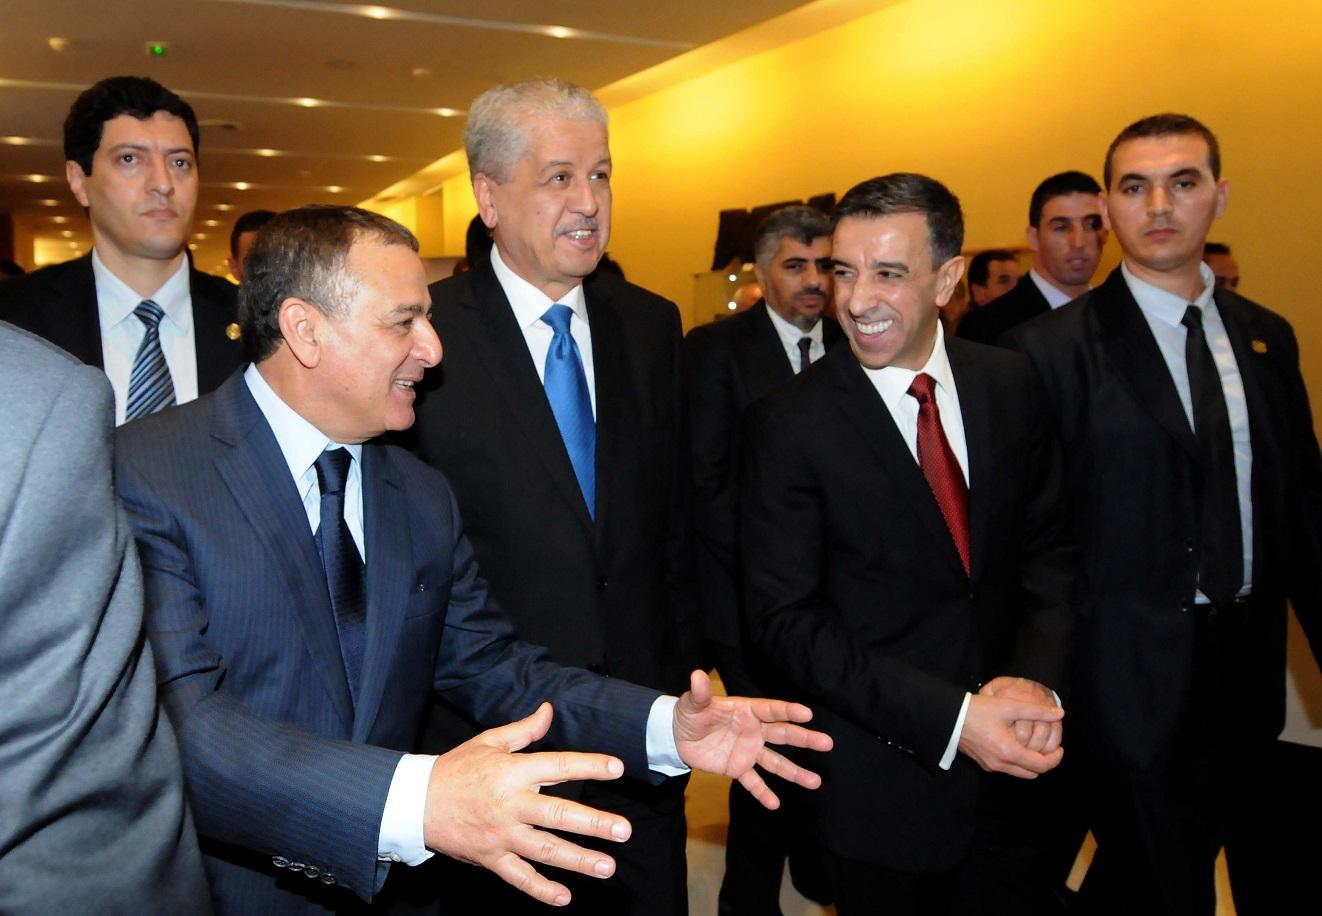 Abdelmalek Sellal, Abdesselam Bouchouareb et Ali Haddad. New Press